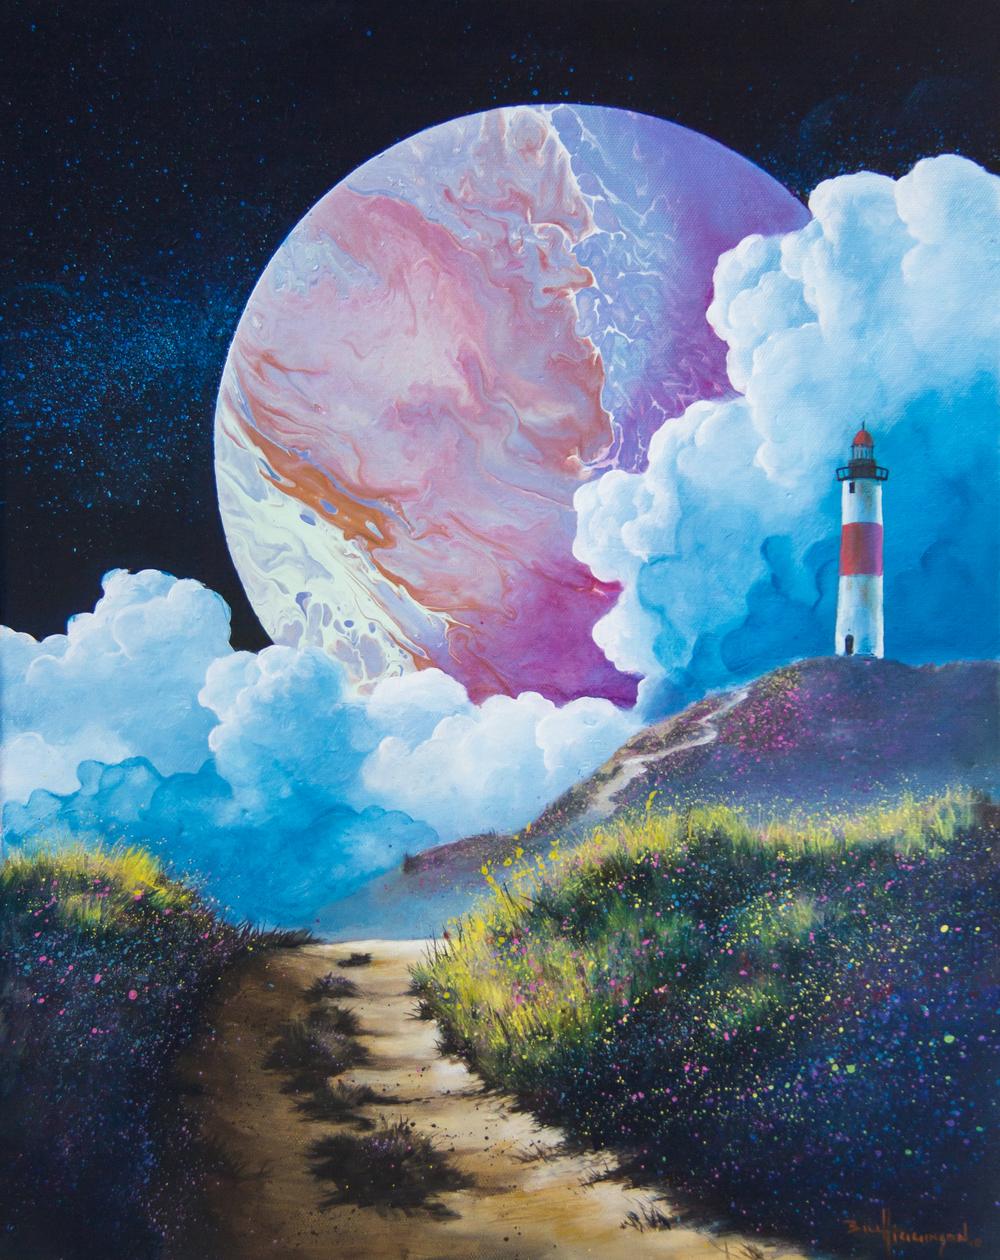 bill-higginson/art/pearl-moon/childrens-fantasy-landscape-surrealism